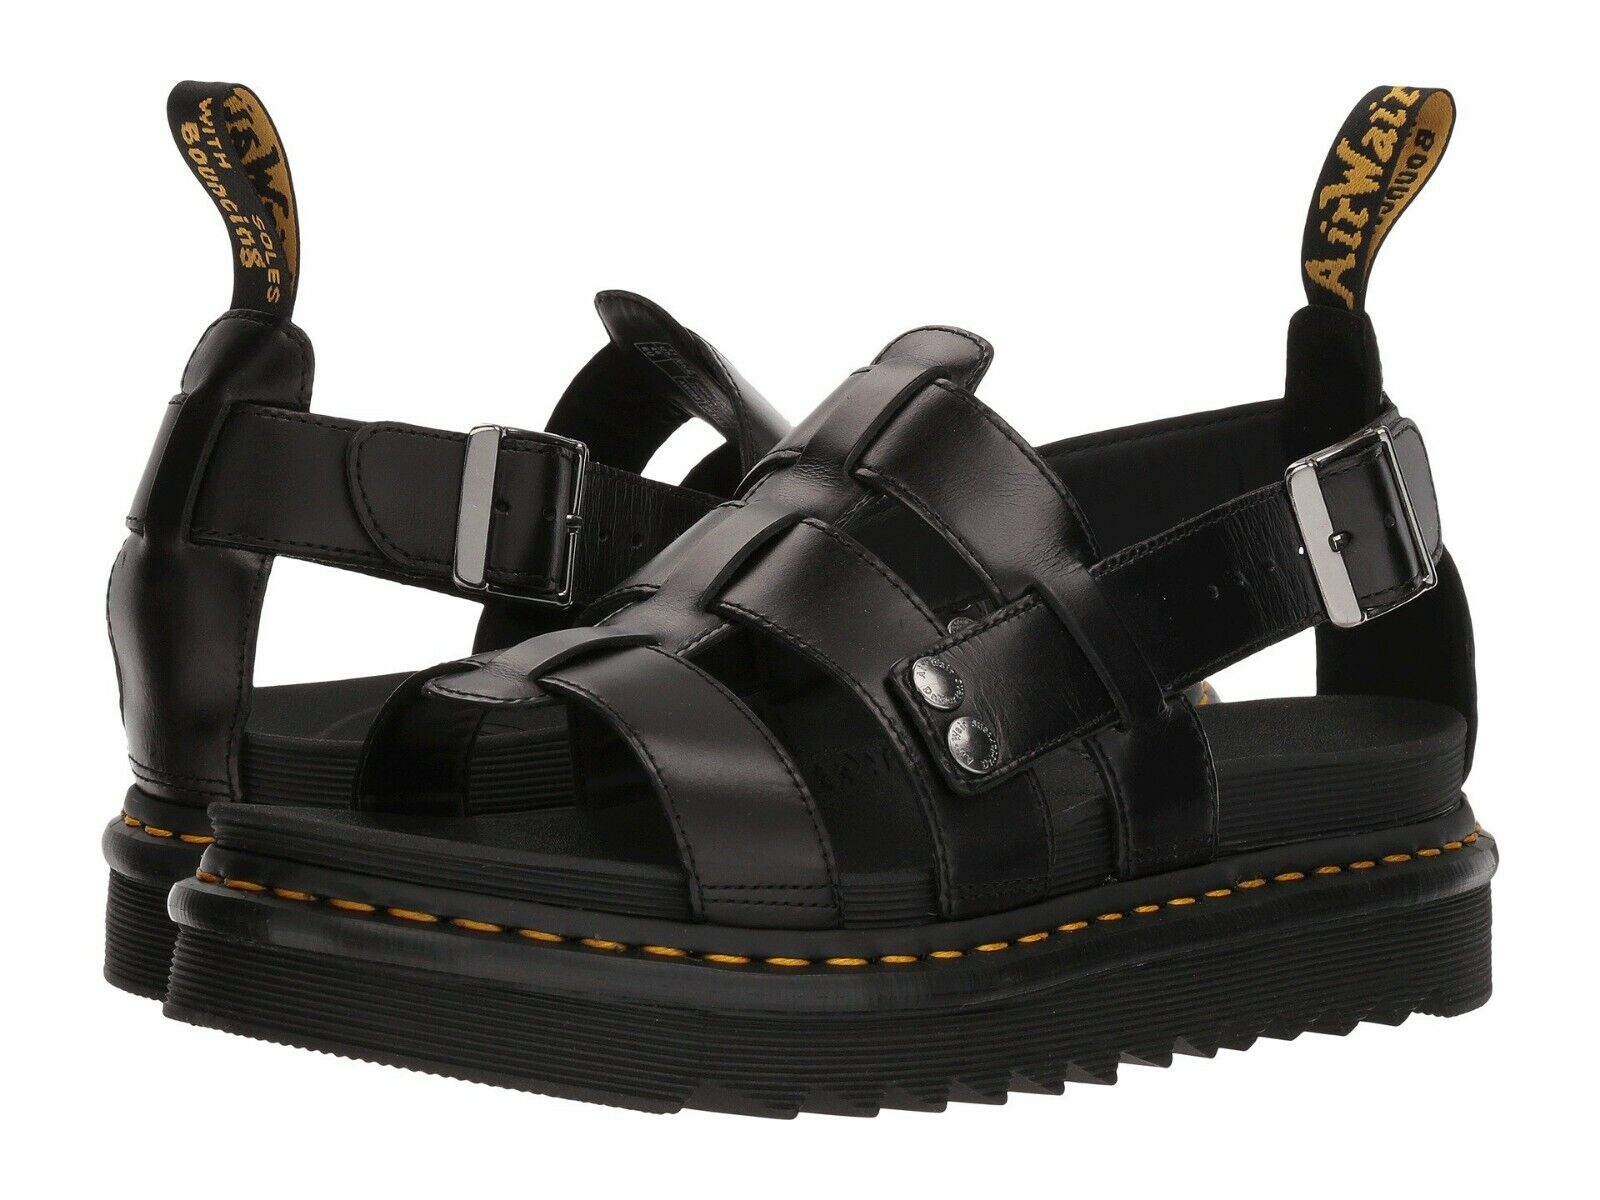 Men's Shoes Dr. Martens TERRY Leather Fisherman Sandals 23521001 BLACK BRANDO